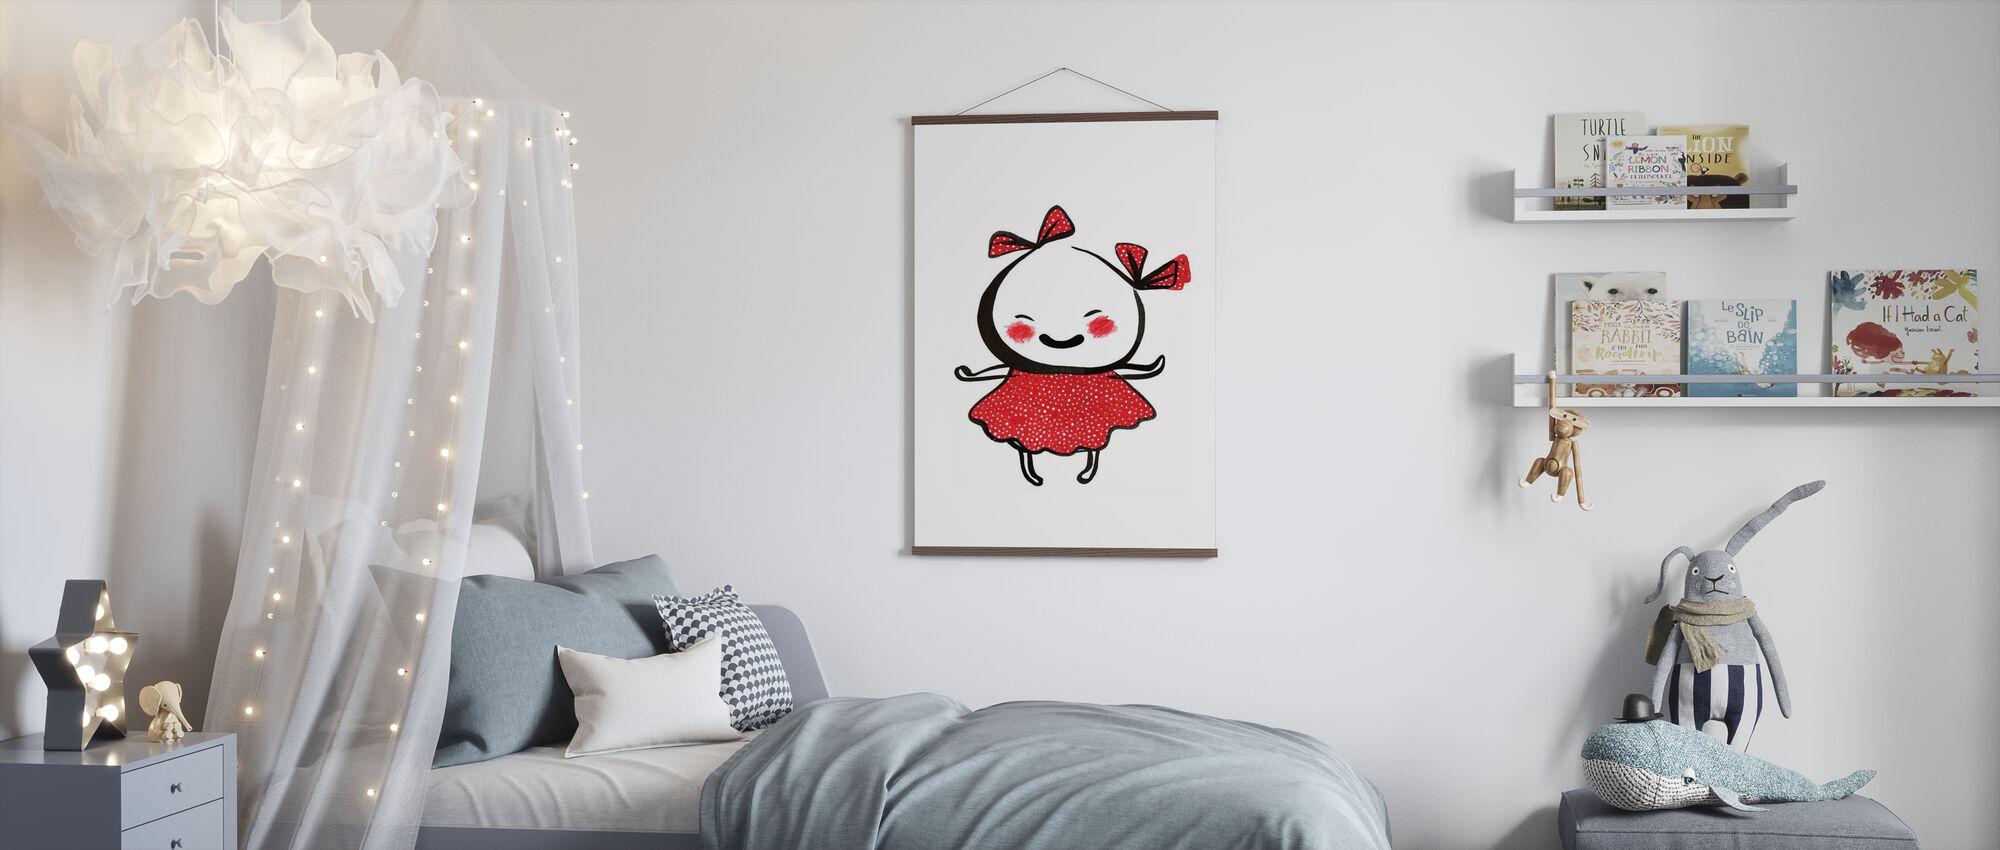 Mariko - Plakat - Børneværelse